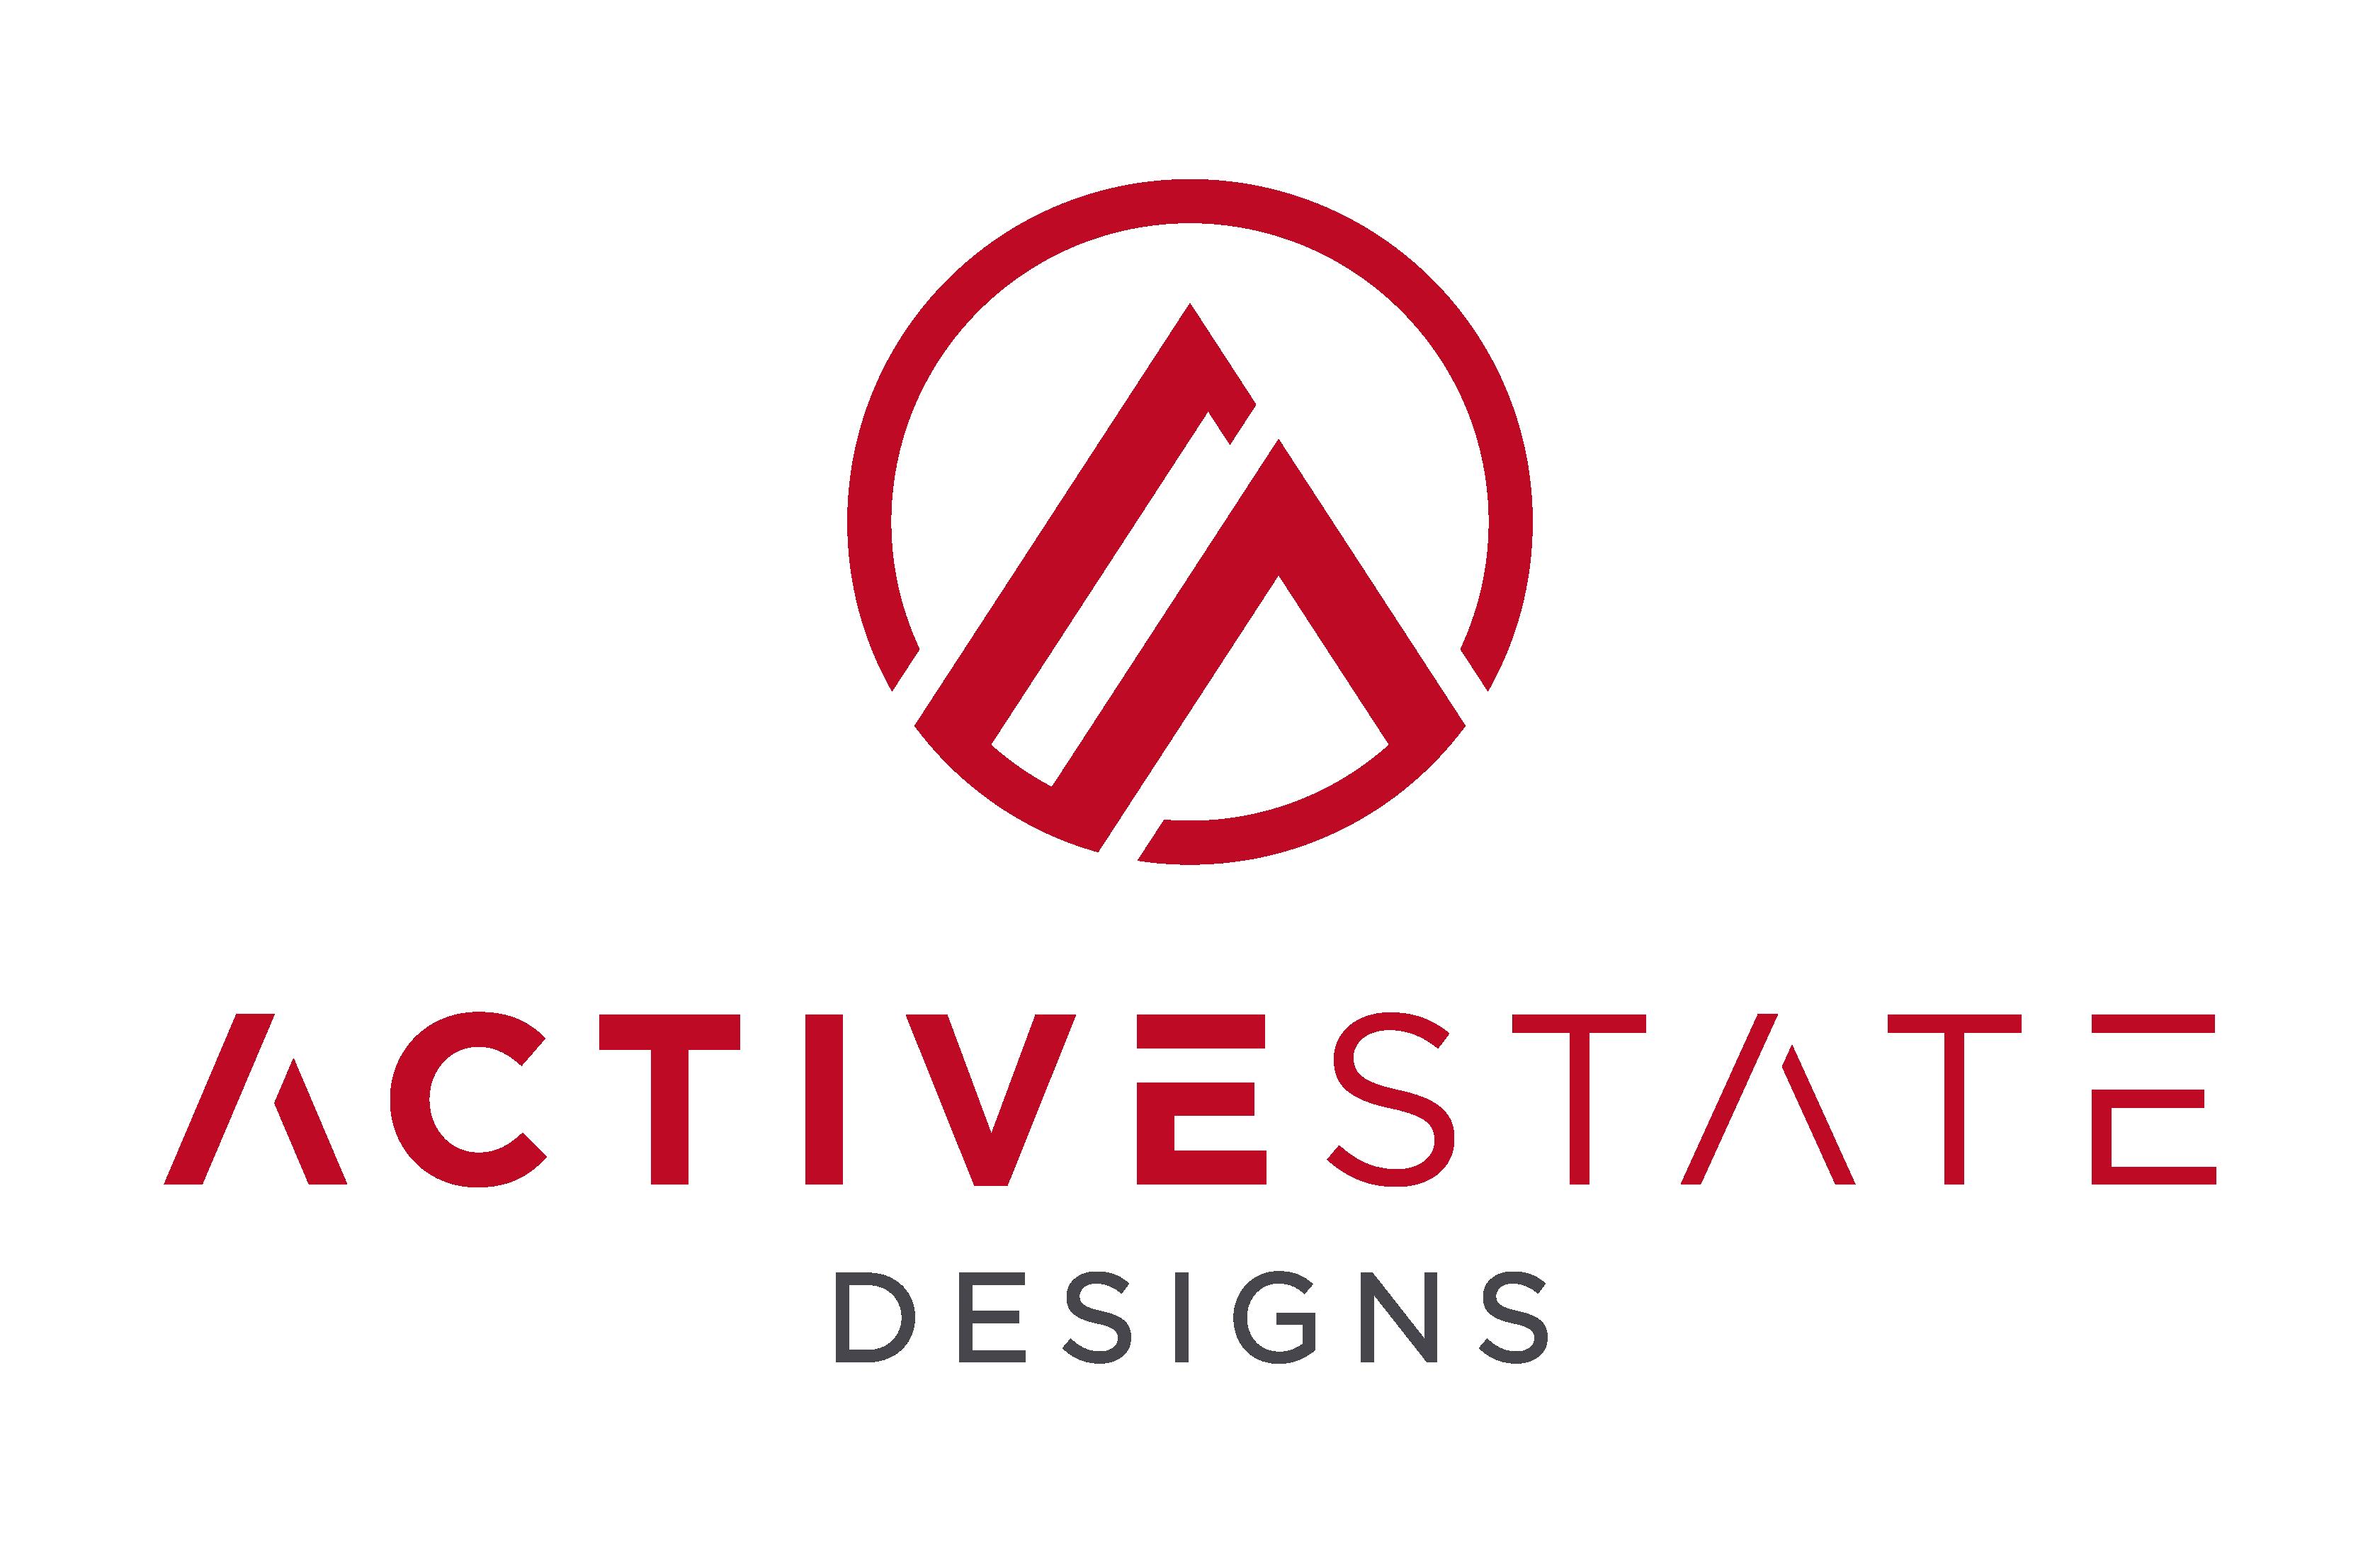 Design a sleek logo for ActiveState Designs, a Denver based active clothing company.